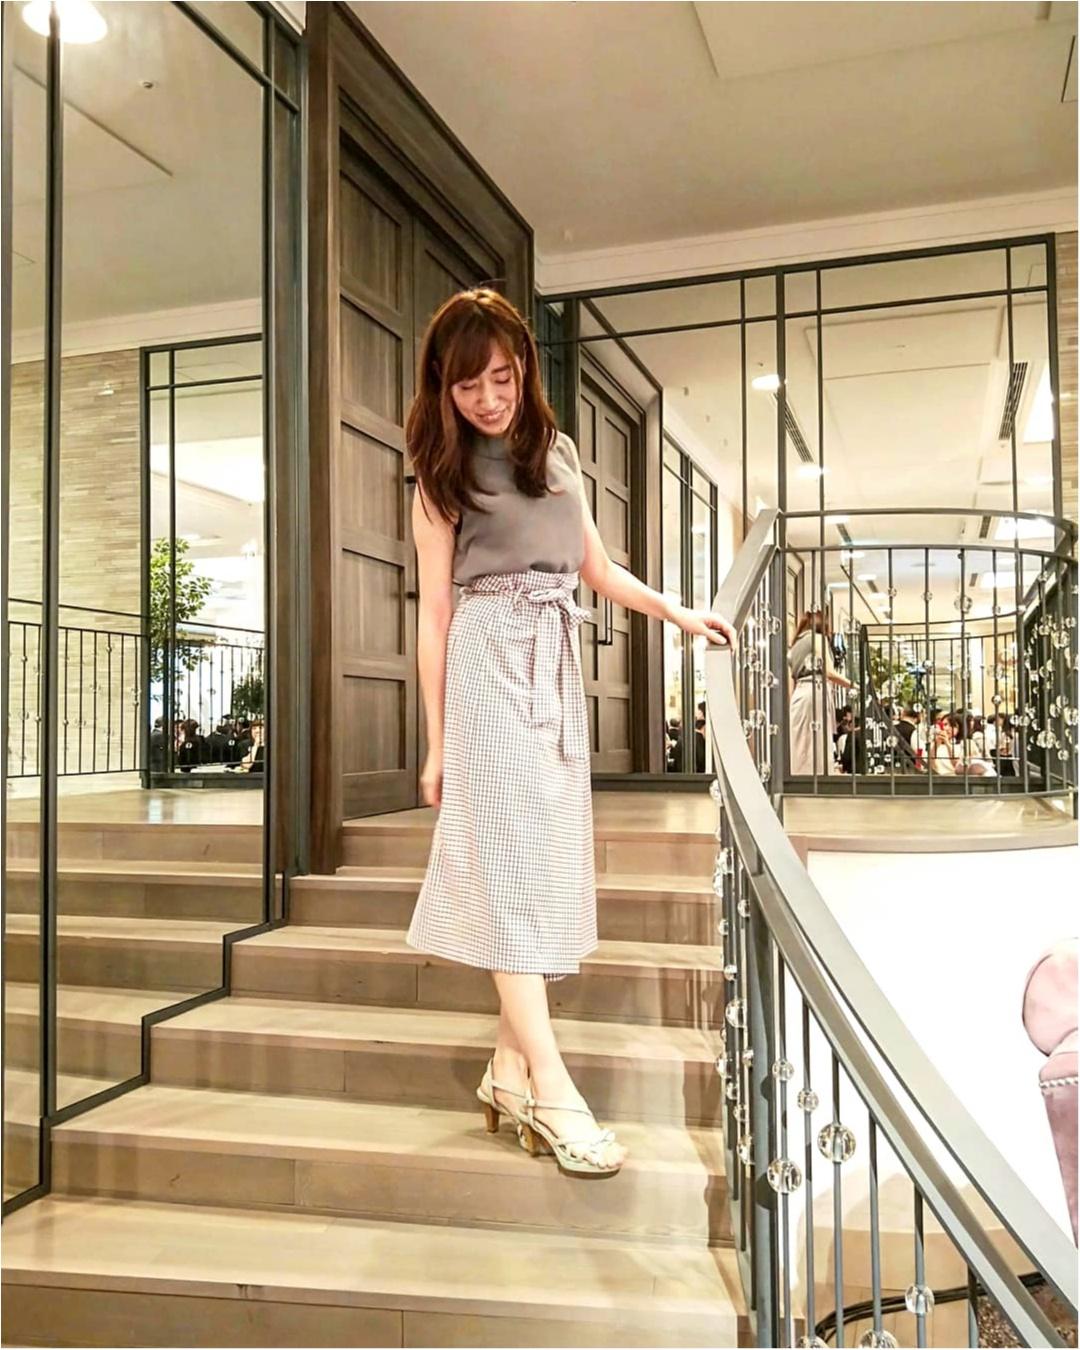 【ZARAセール】チェック柄ラップスカートが1000円台!ハイウエストデザインがお気に入り!_2